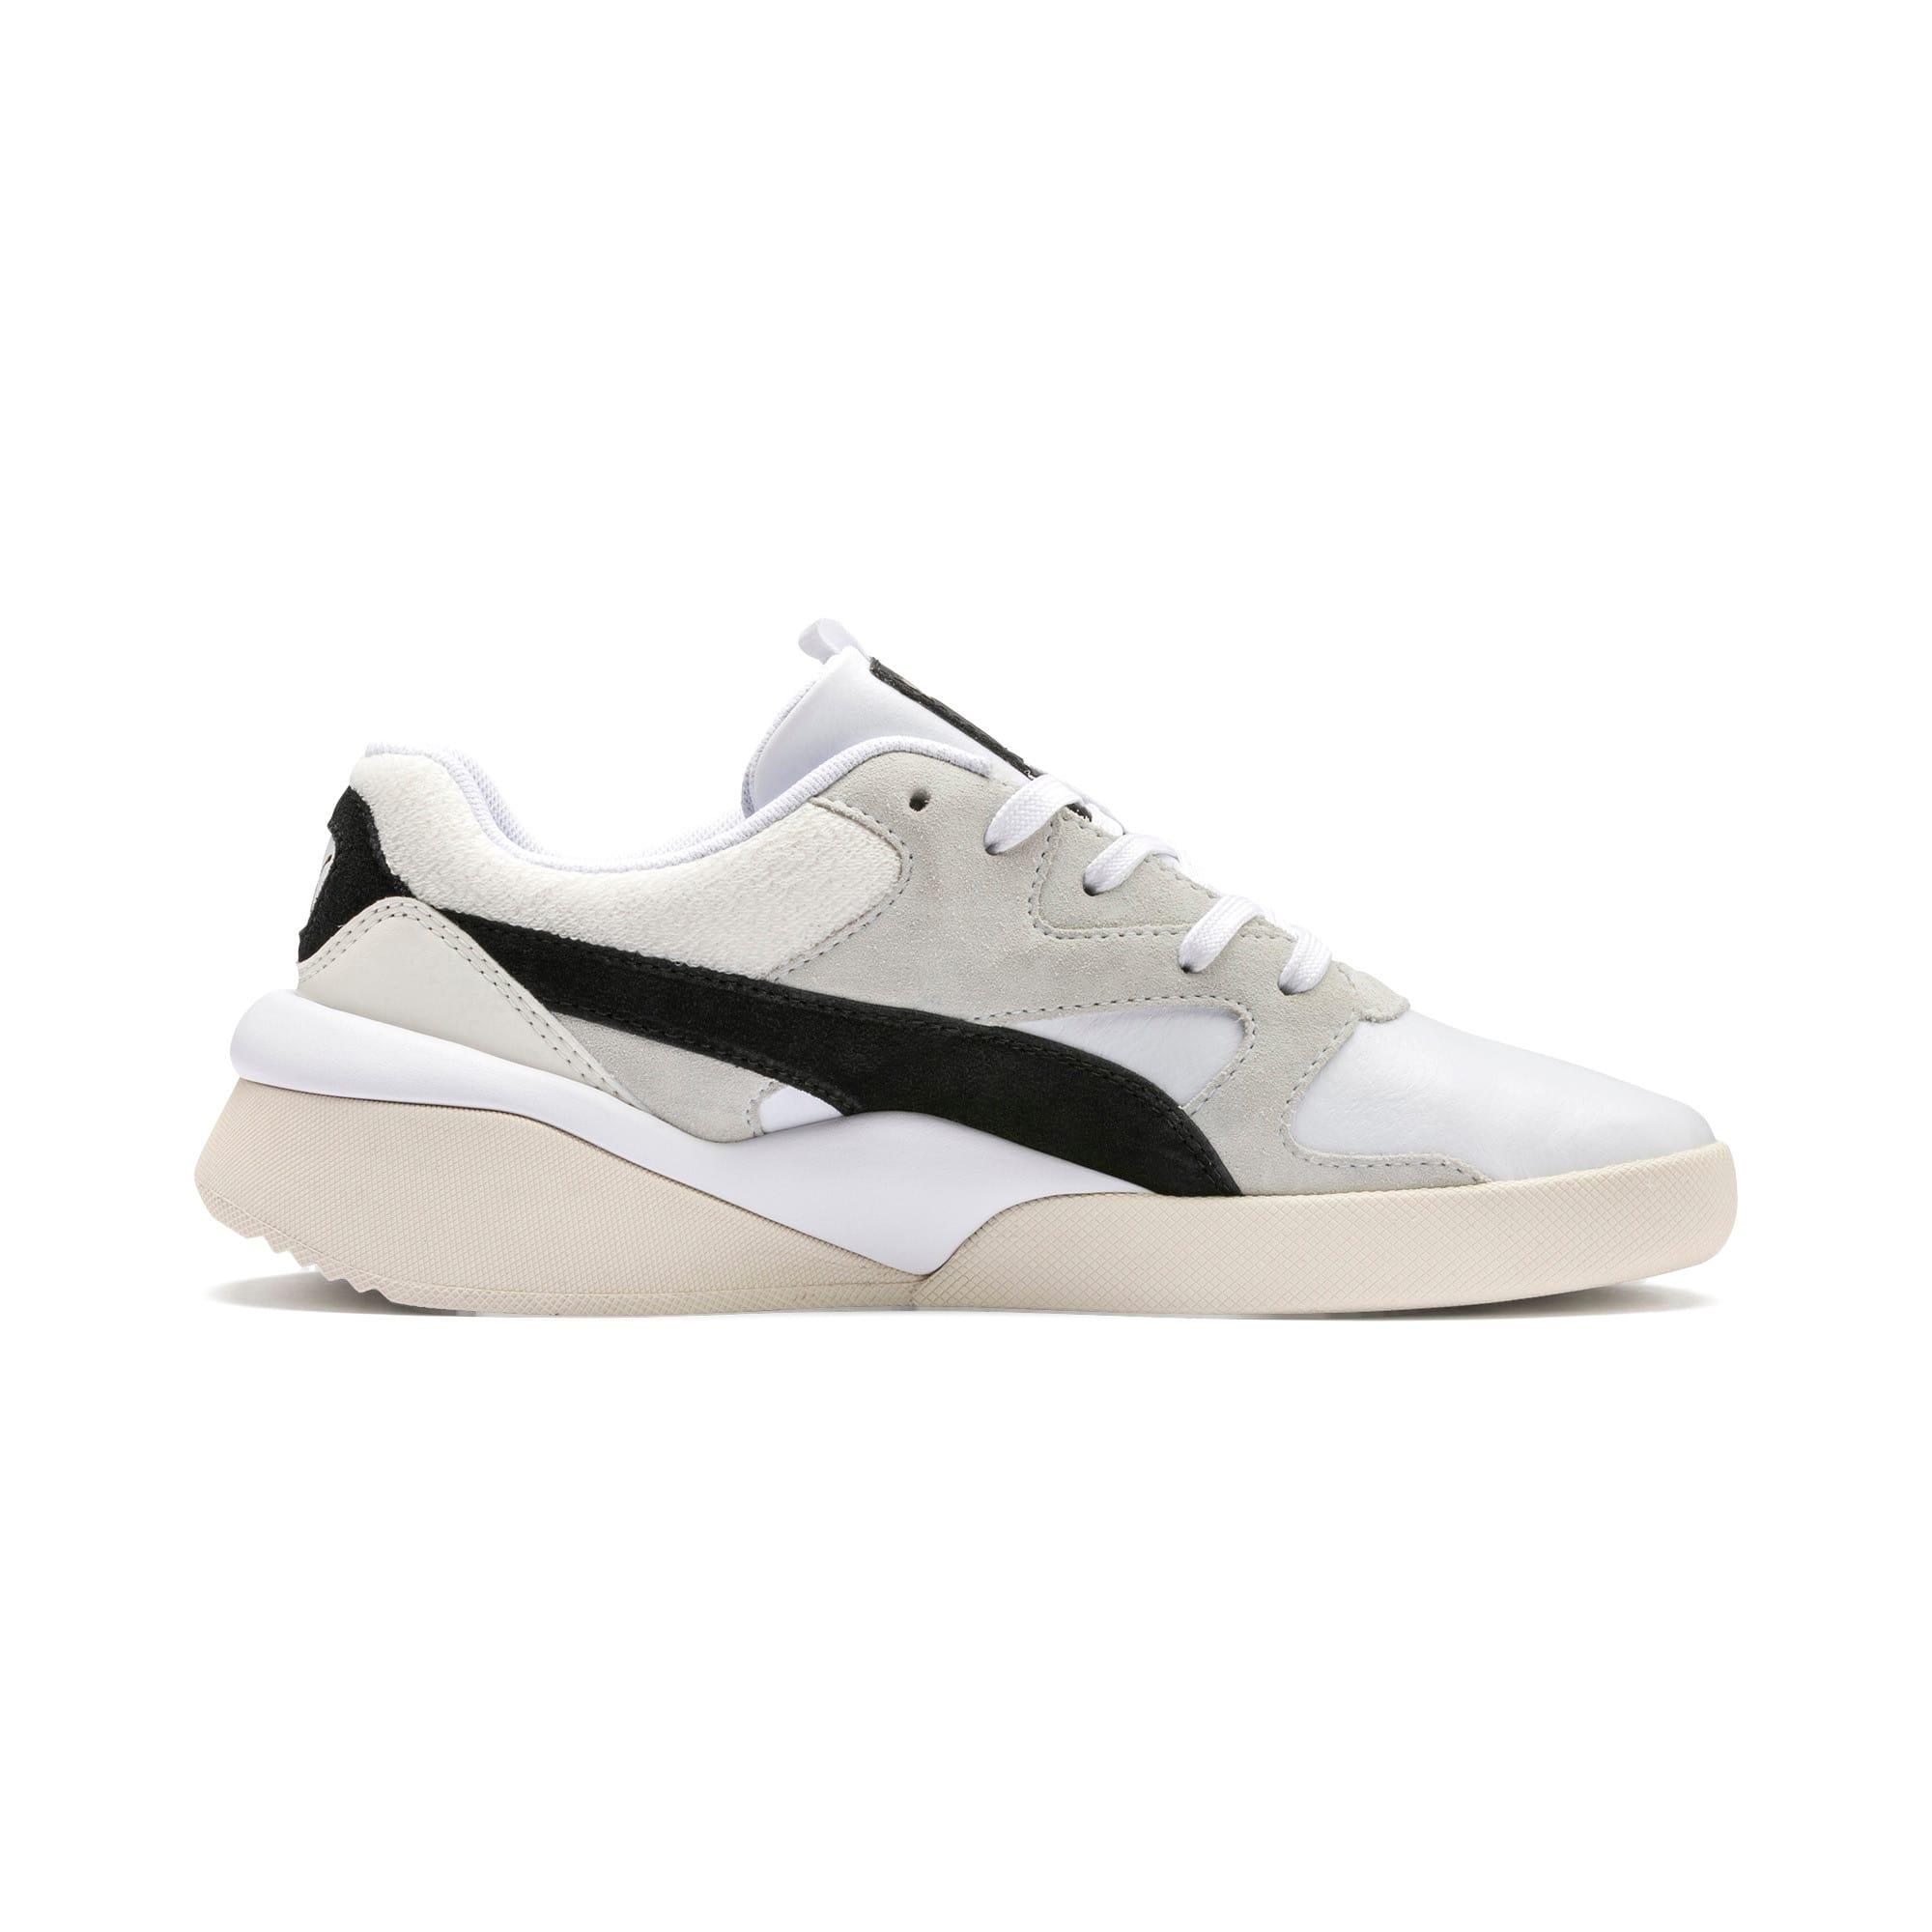 Thumbnail 6 of Aeon Heritage Women's Sneakers, Puma White-Puma Black, medium